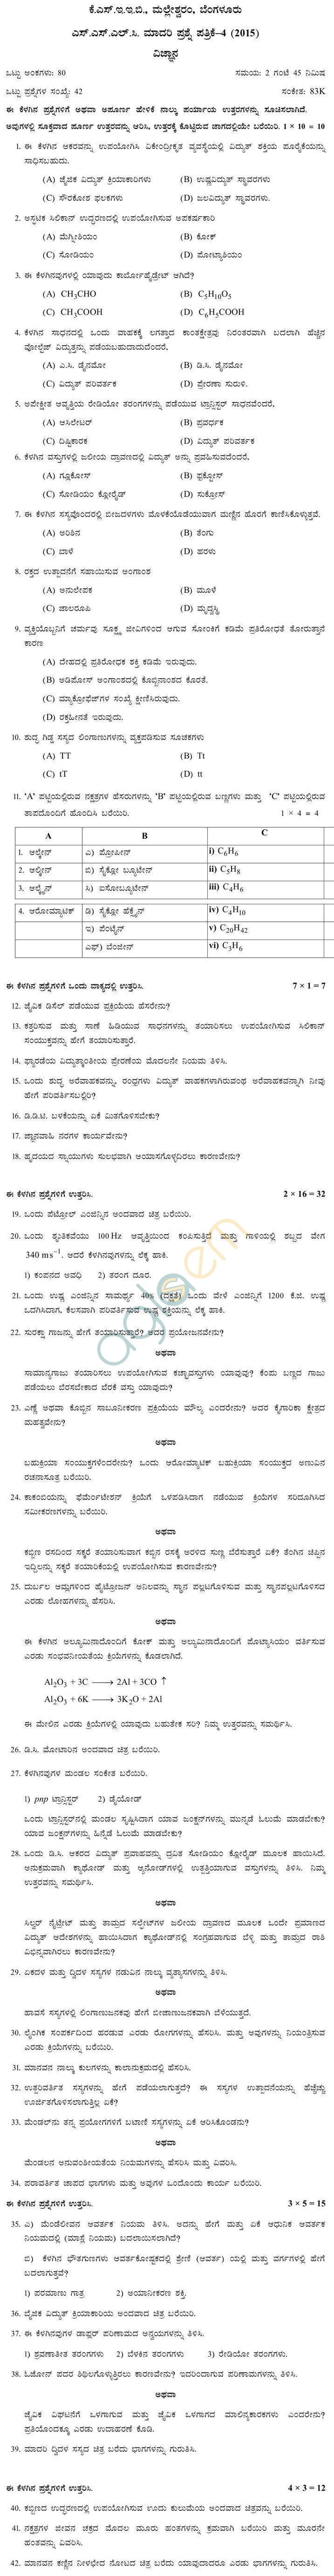 Karnataka Board SSLC Model Question Papers 2015 forScience